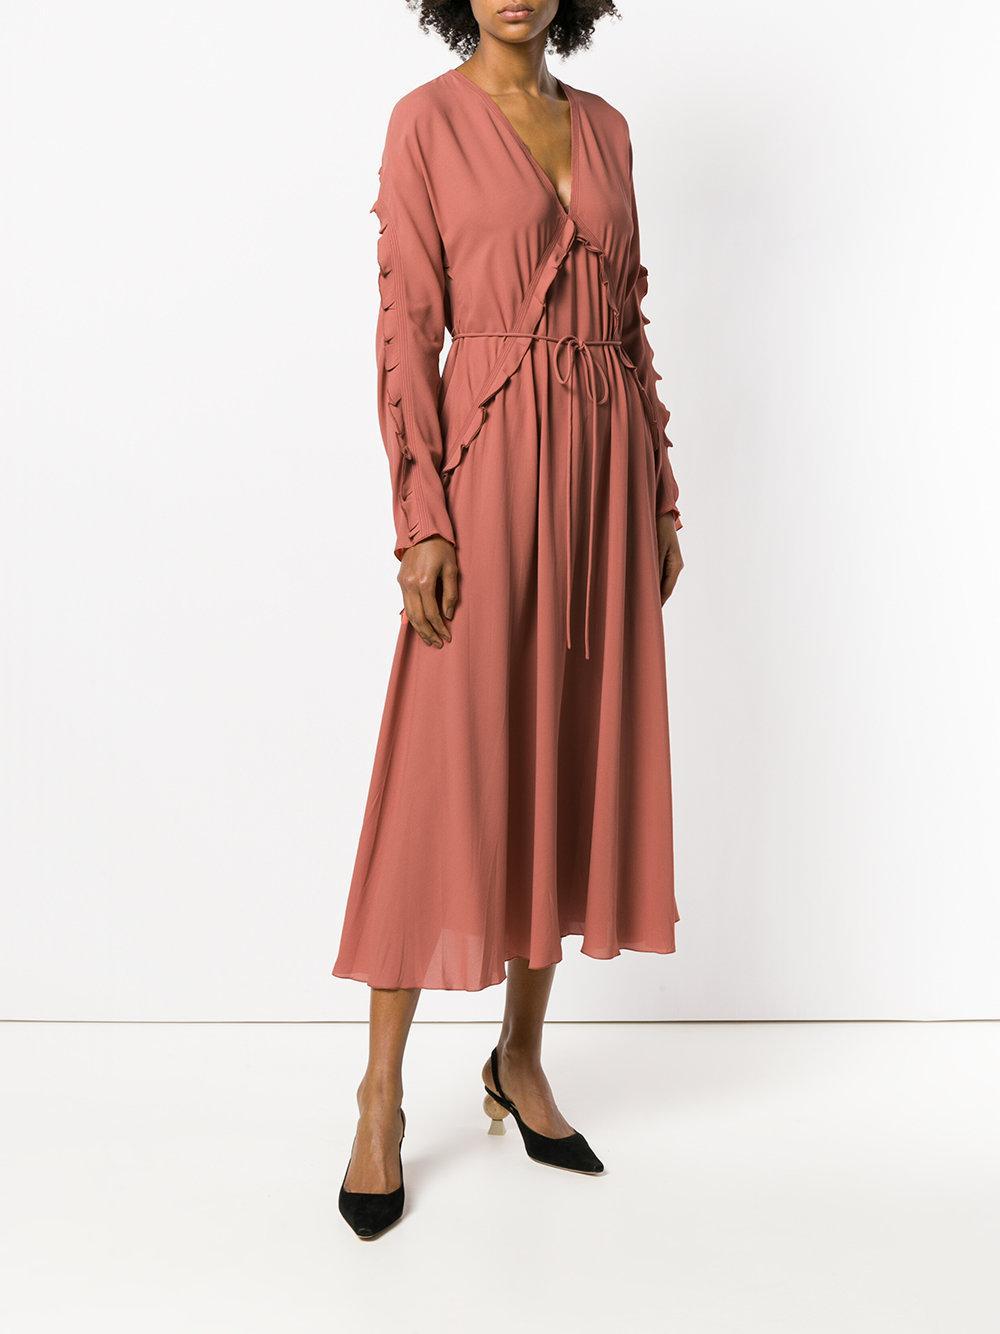 ruffle front dress - Yellow & Orange Bottega Veneta Explore Cheap Online Excellent lnlcoKTADH